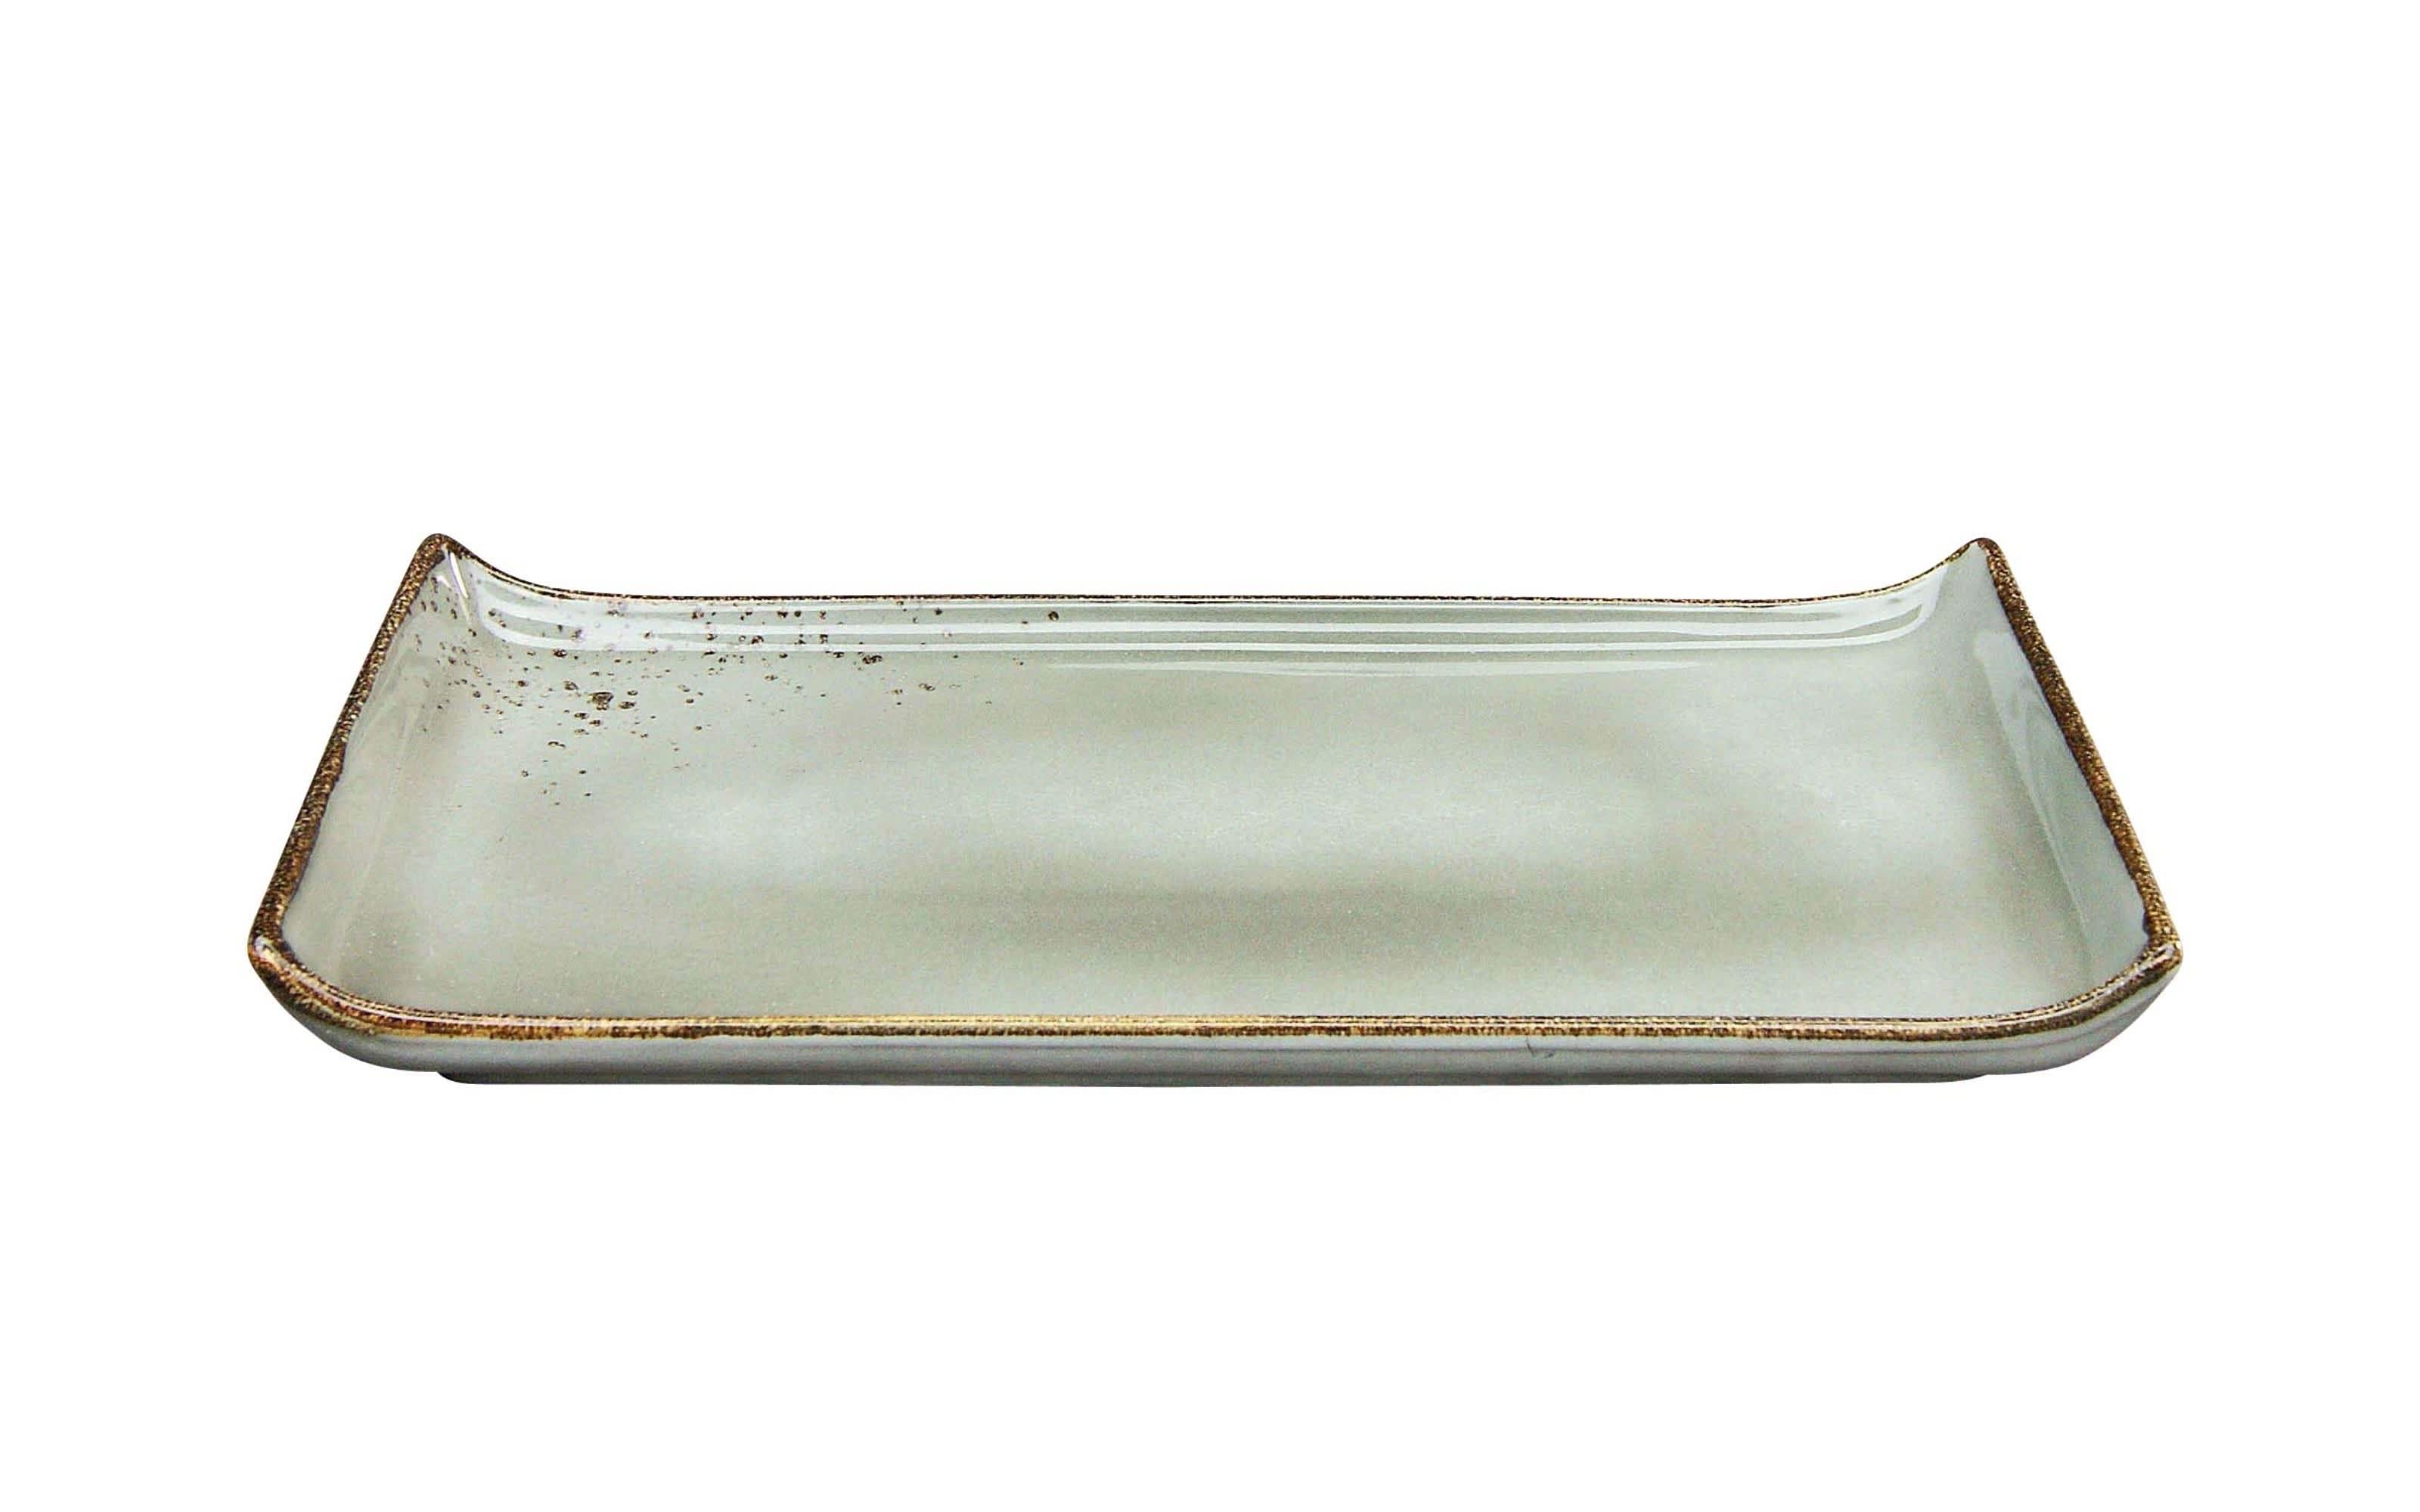 BBQ Platte Nature Collection in steingrau, 33 x 16,5 cm